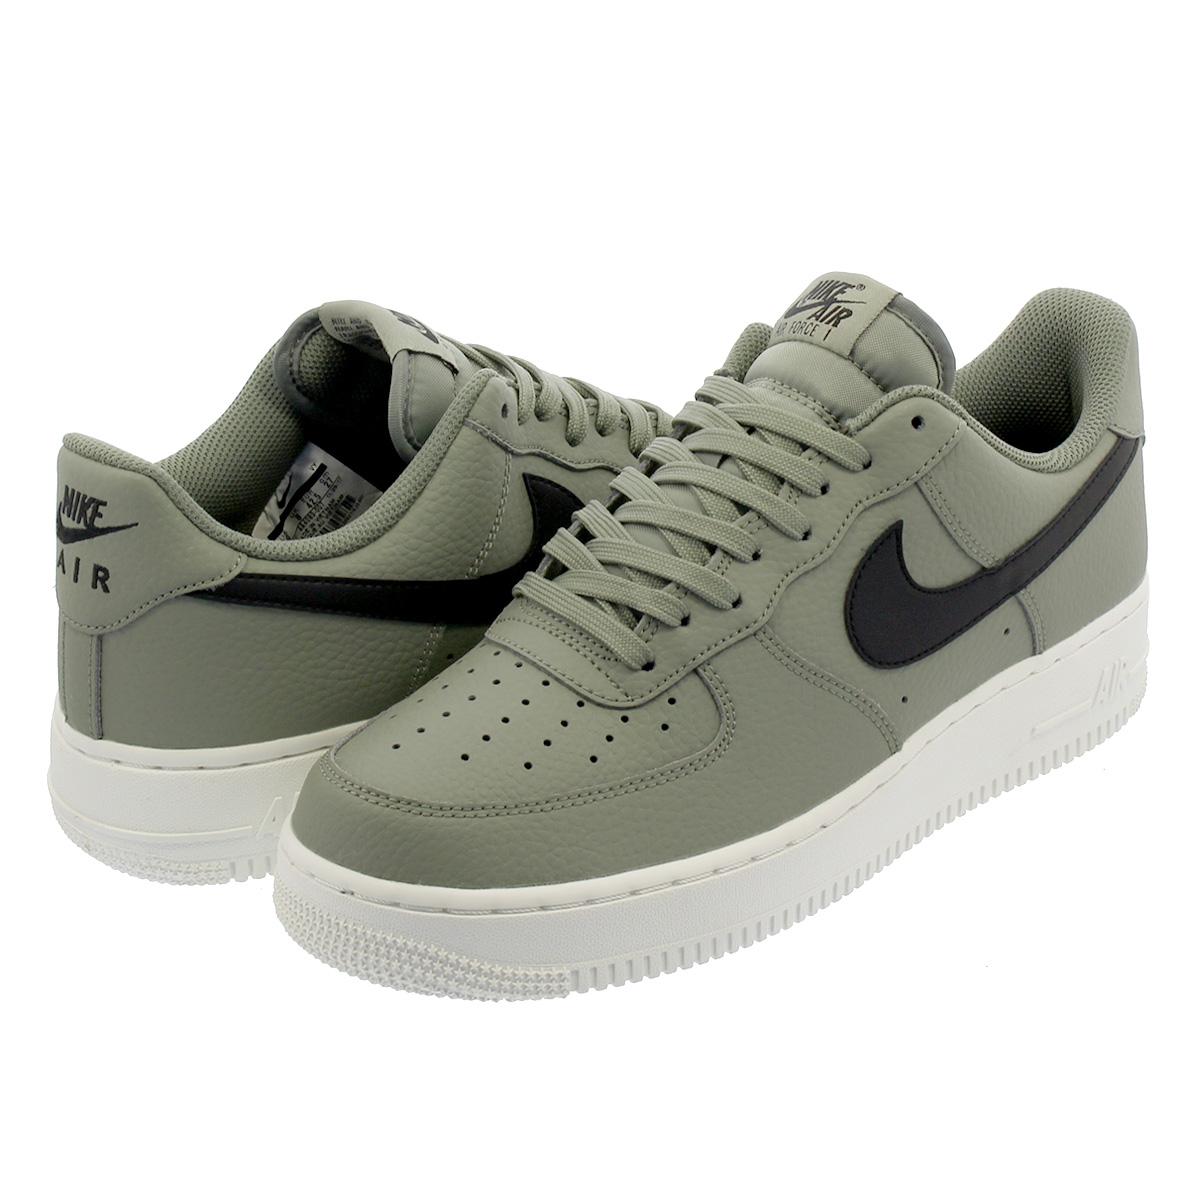 Nike Air Force 1 Mid '07 Canvas Mens Shoes Dark StuccoDark